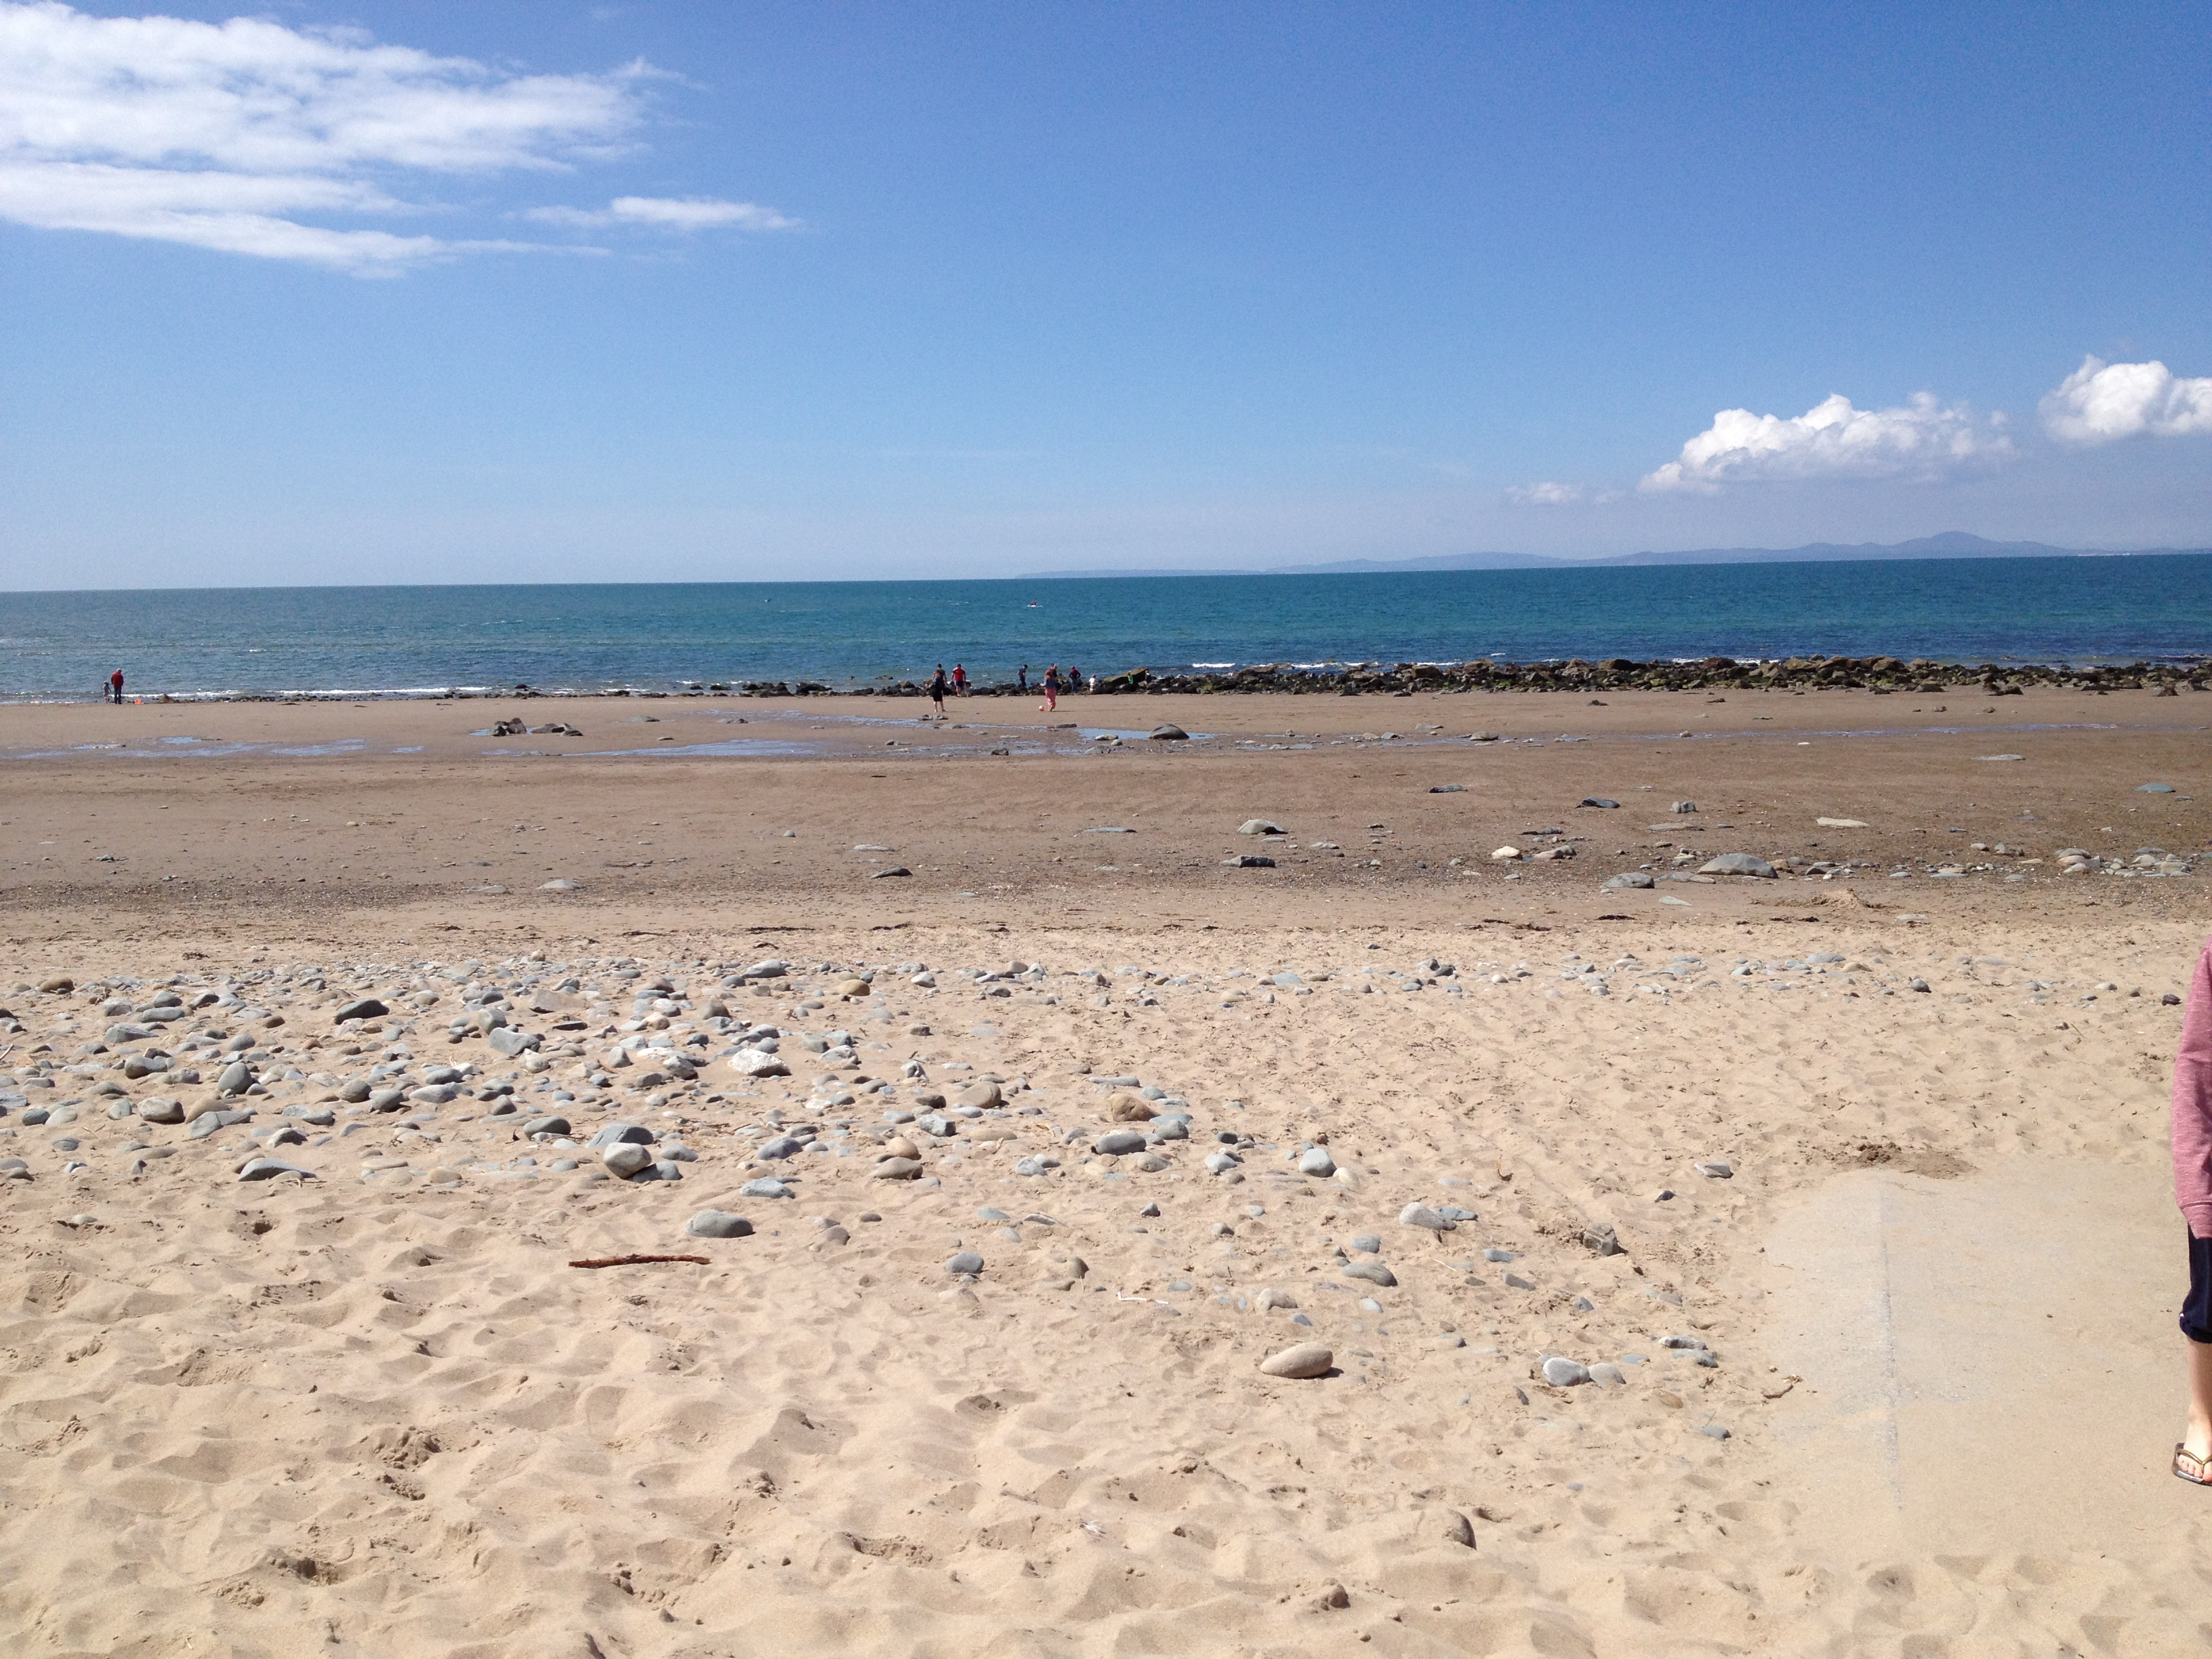 Low tide at Llandanwg showing sandy beach